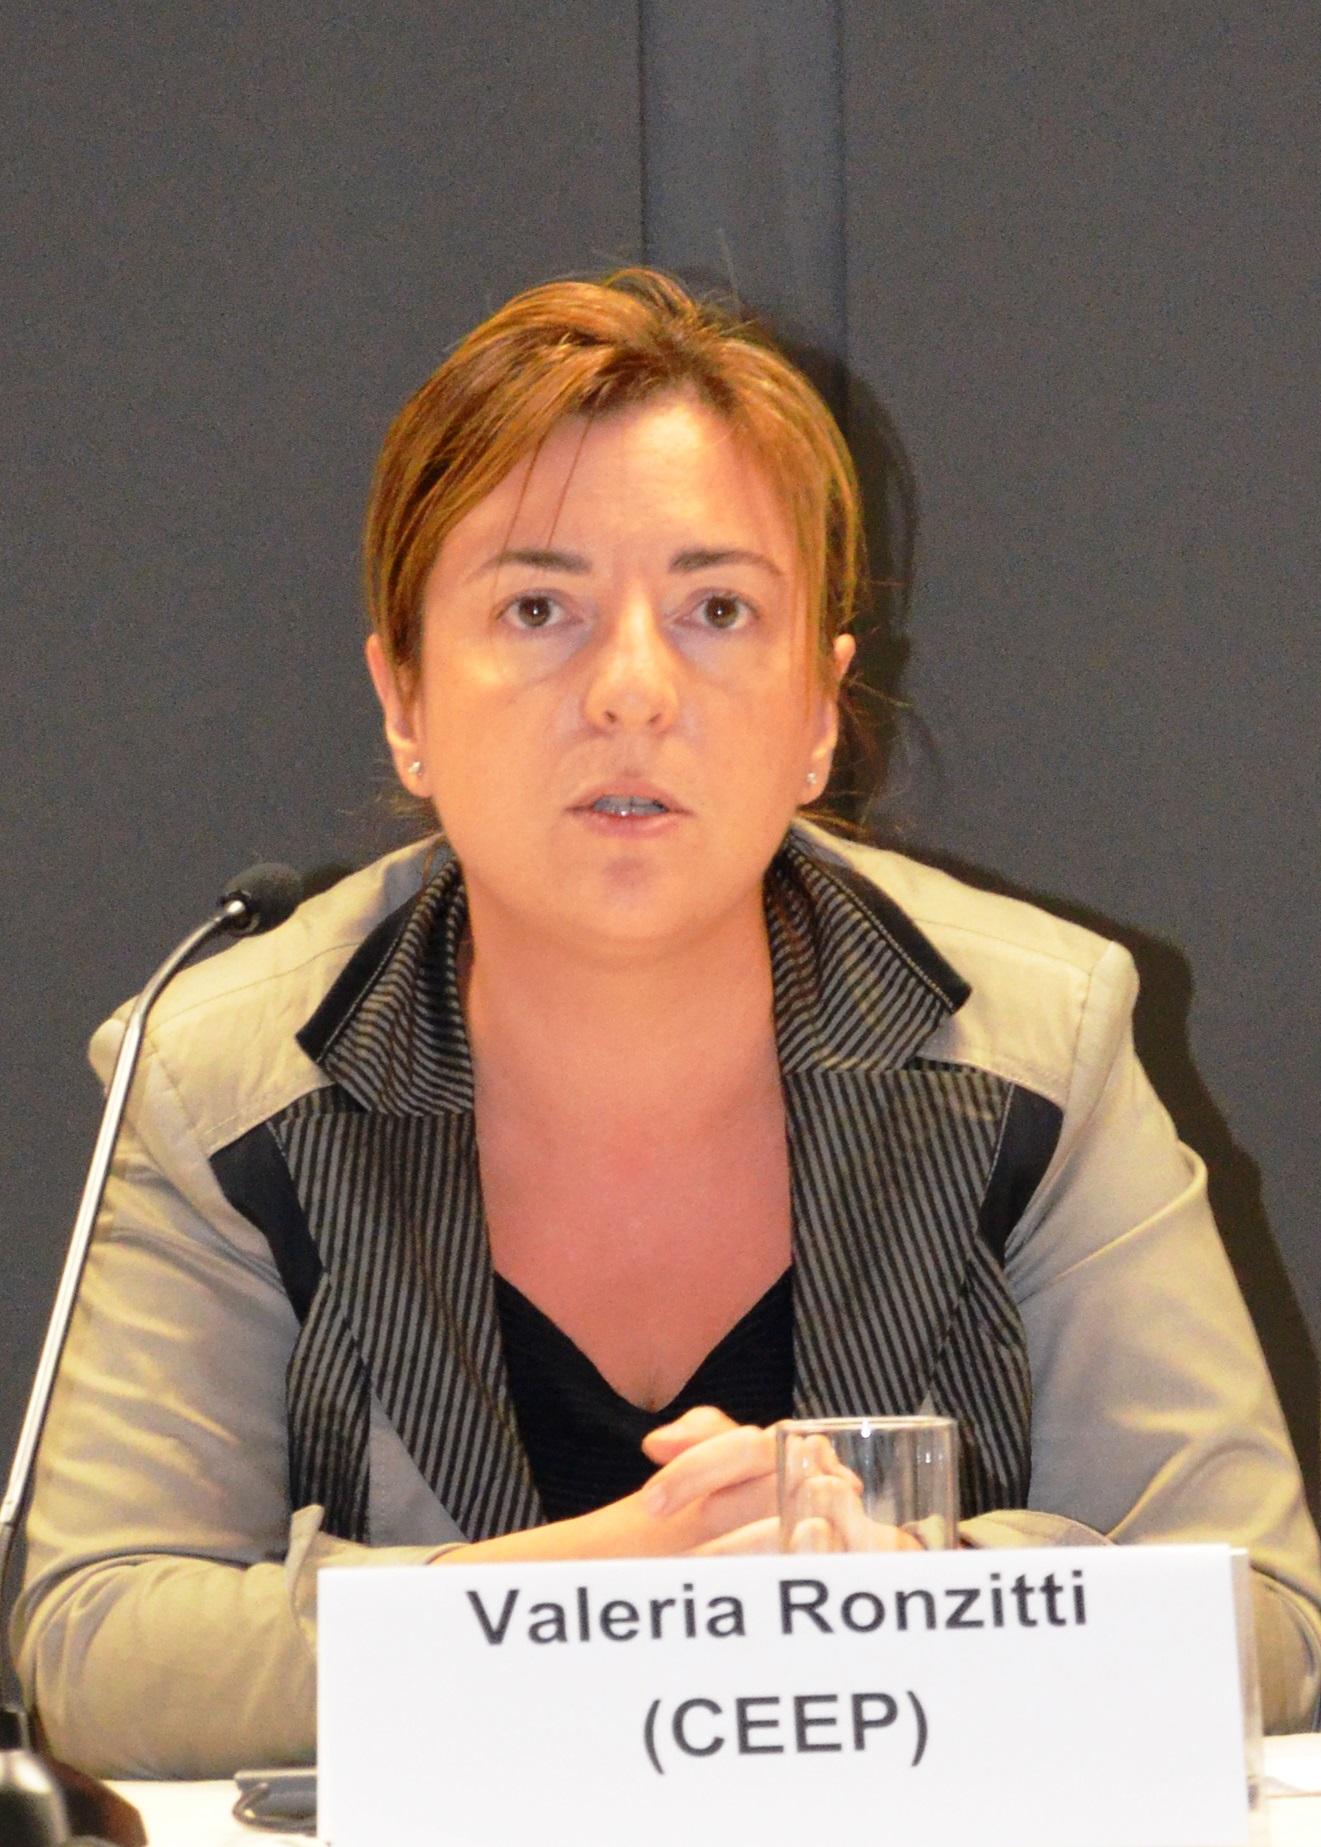 Valeria Ronzitti